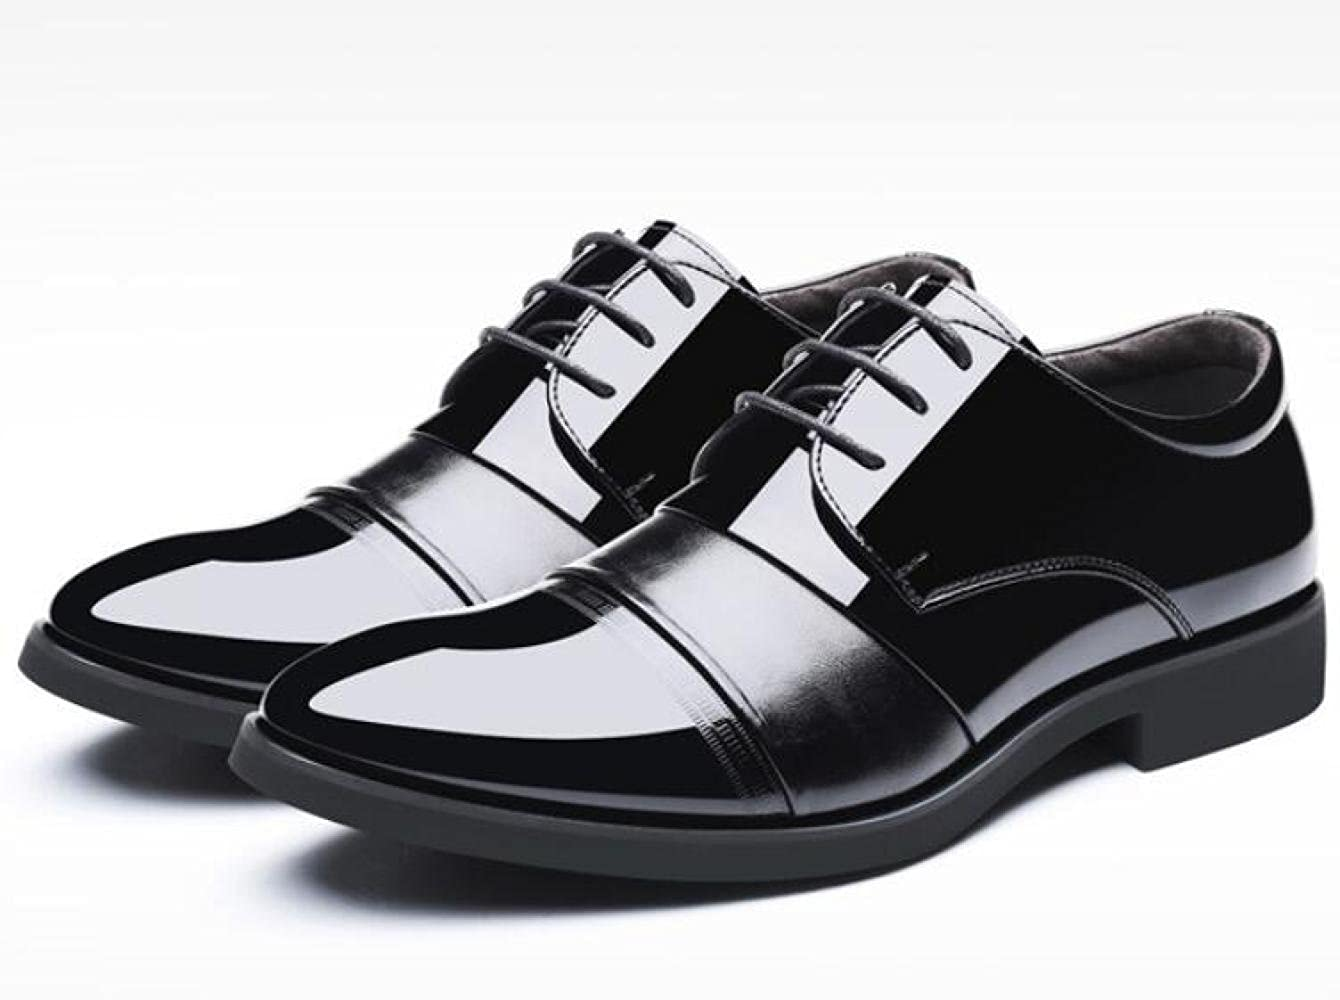 WLFHM Herrenschuhe aus Leder Frühling Hohe Schuhe